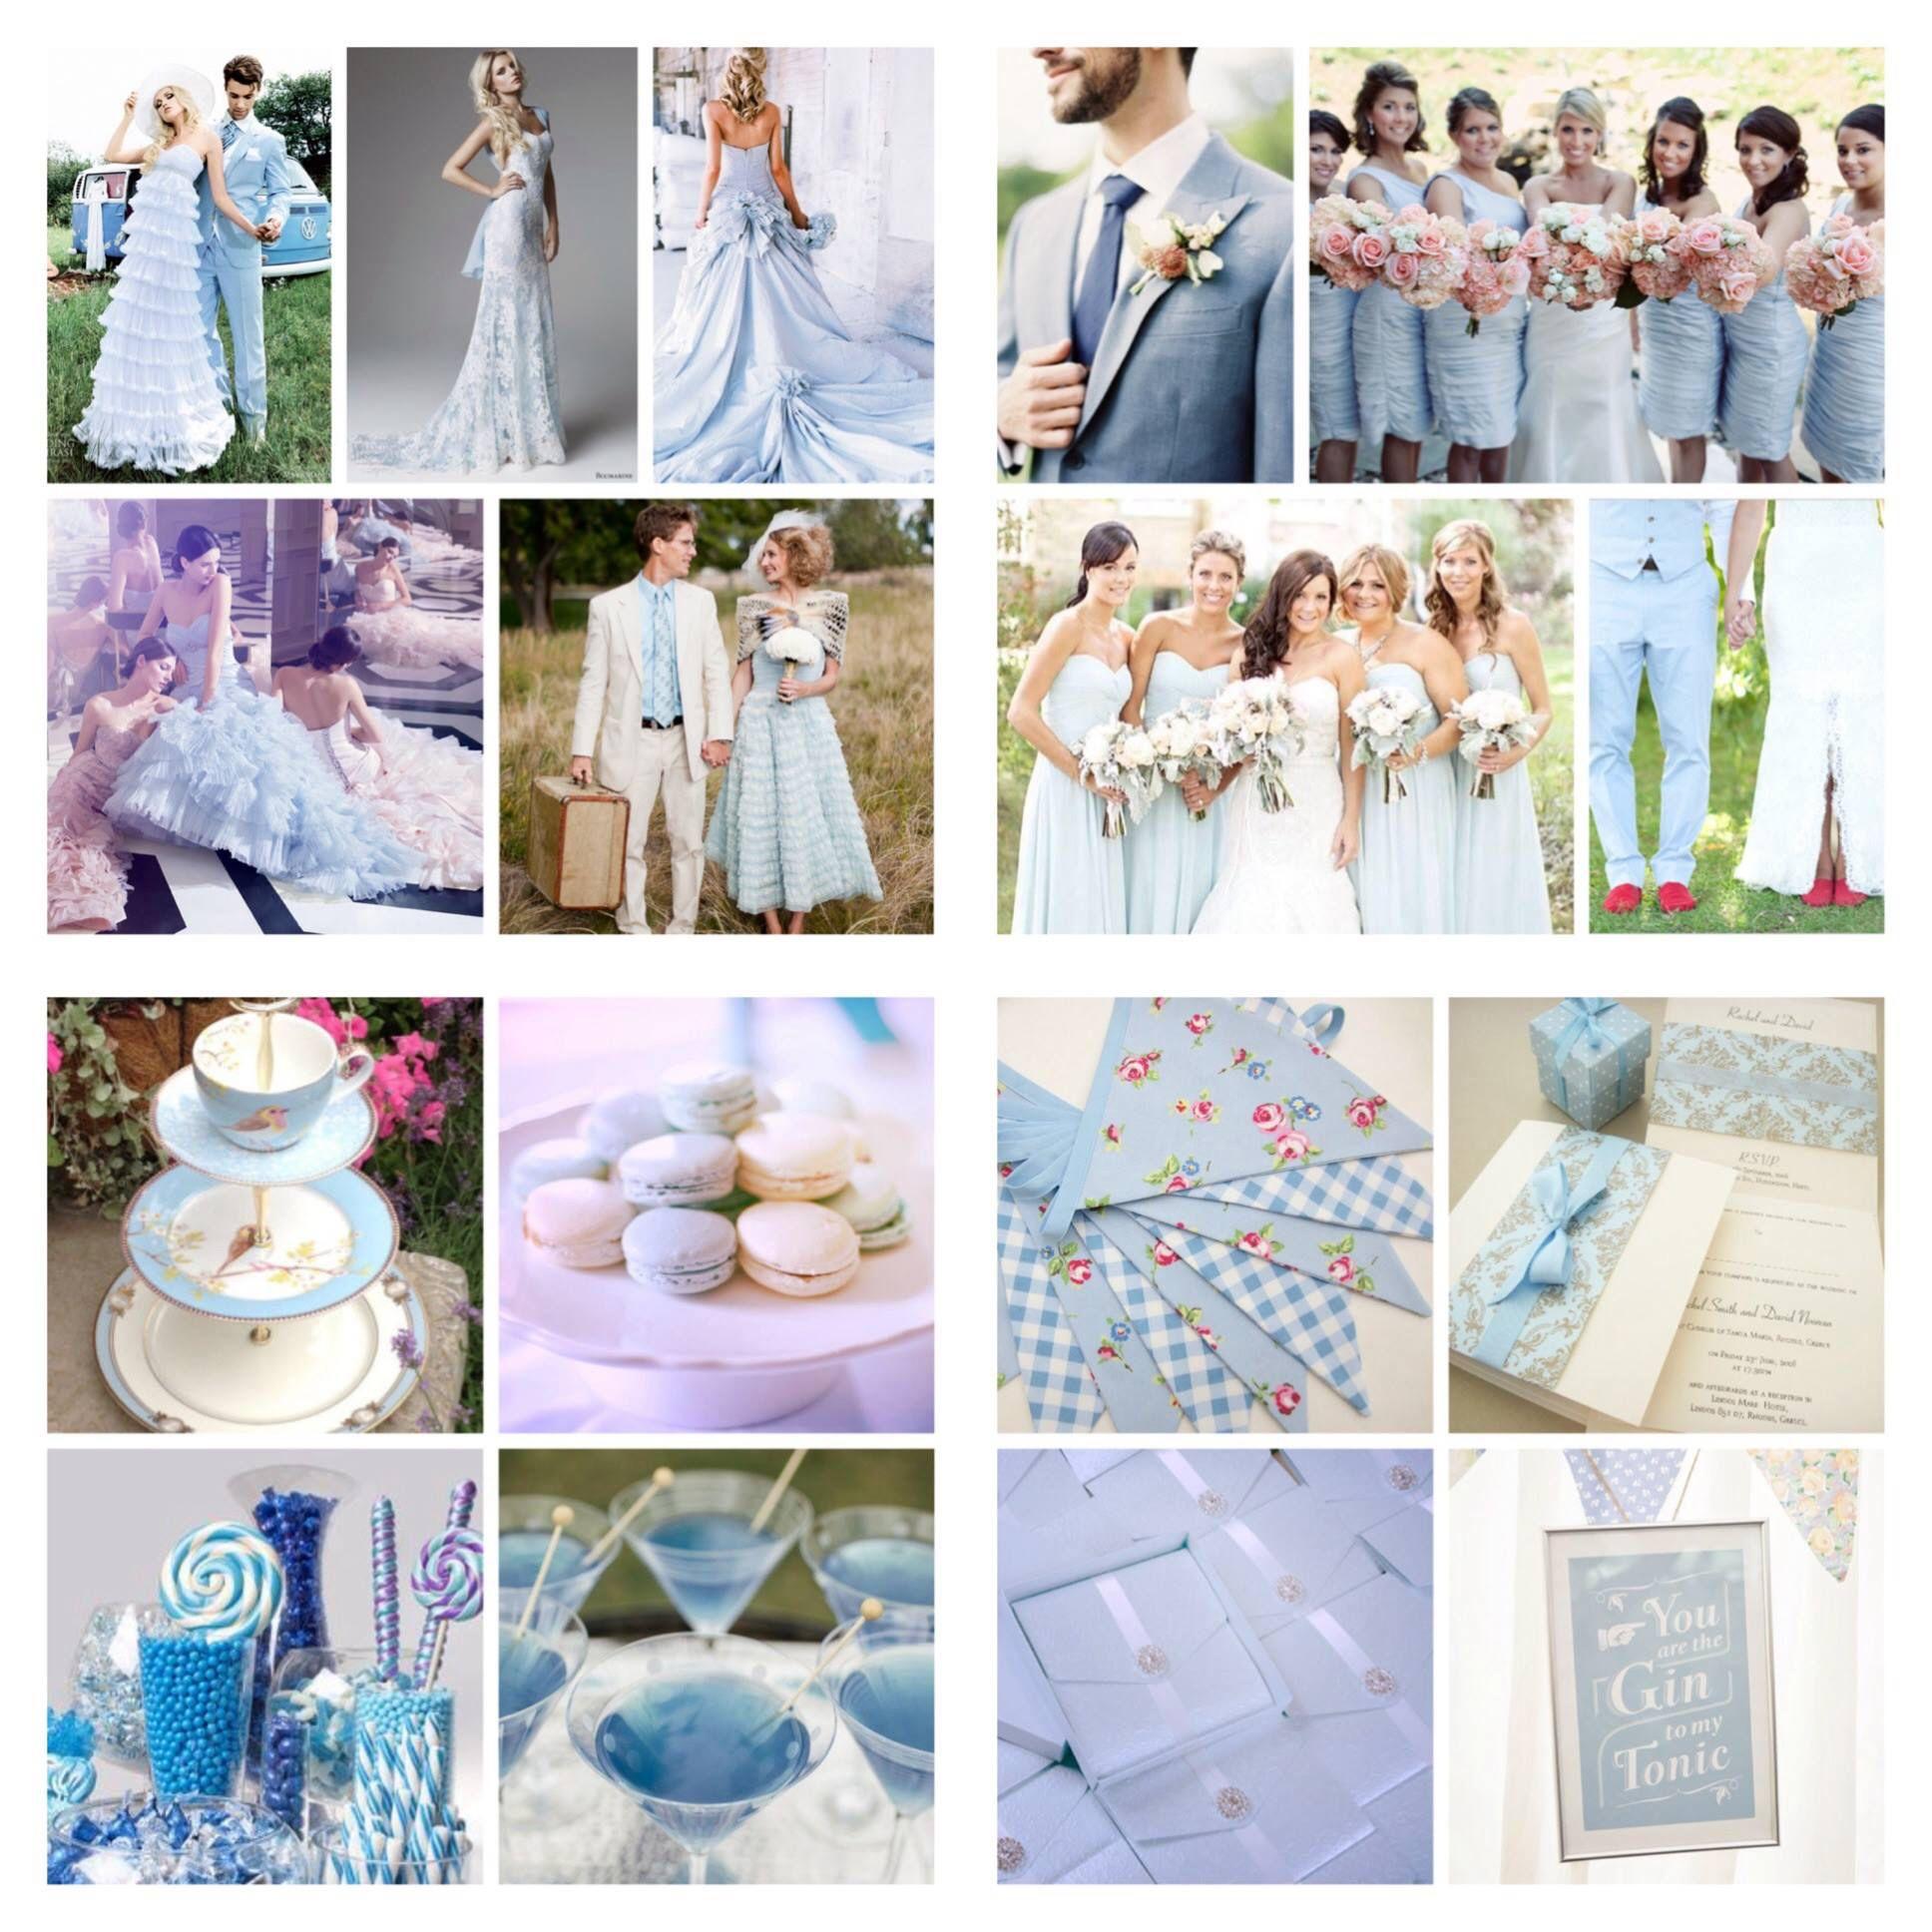 Baby blue shabby chic themed wedding | Wedding themes | Pinterest ...